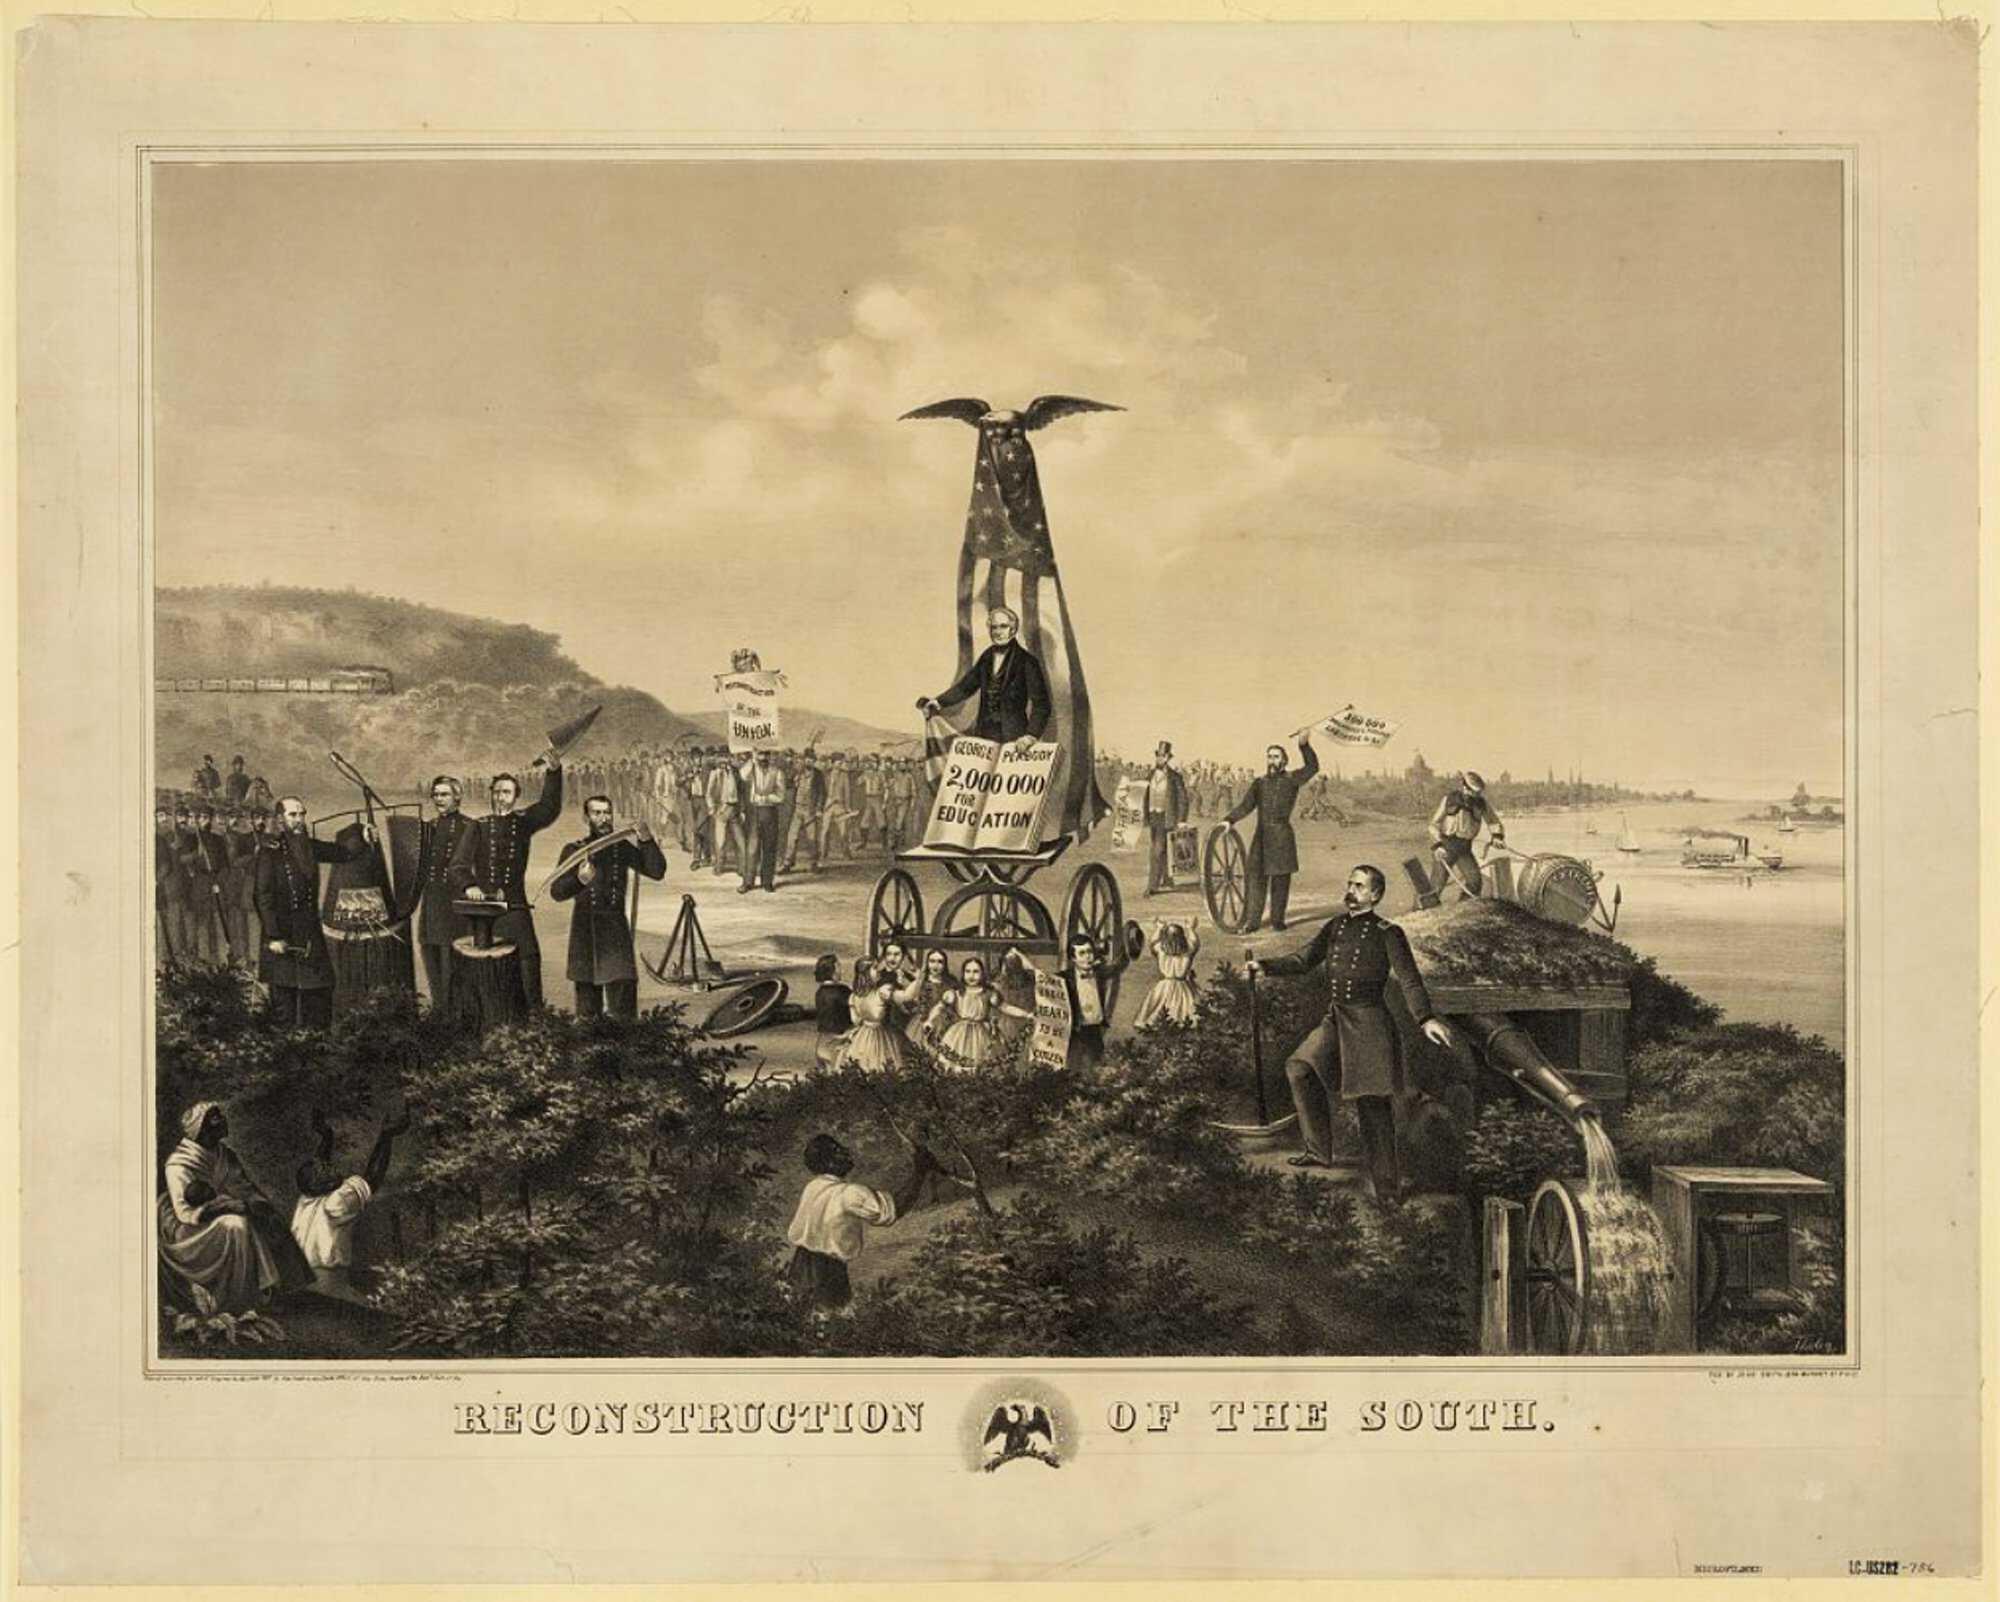 Reconstruction-timeline-1857-LOC.jpg